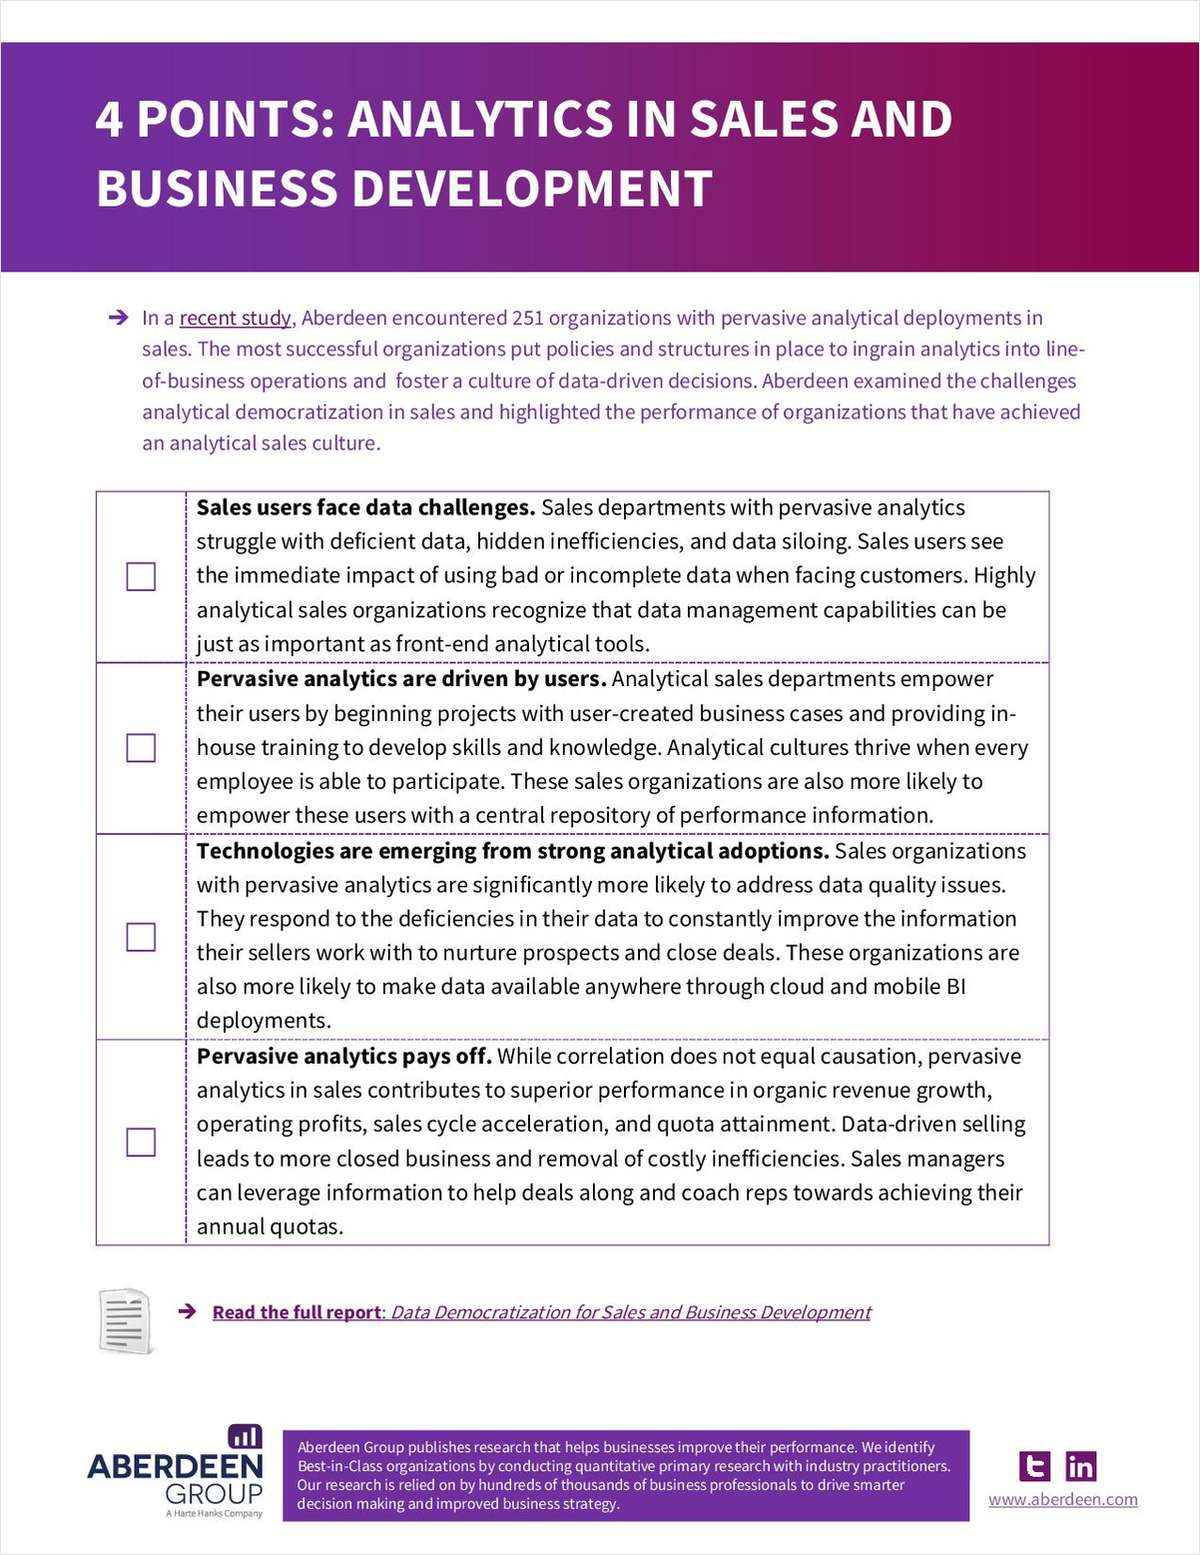 Aberdeen 4 Points: Analytics in Sales and Business Development